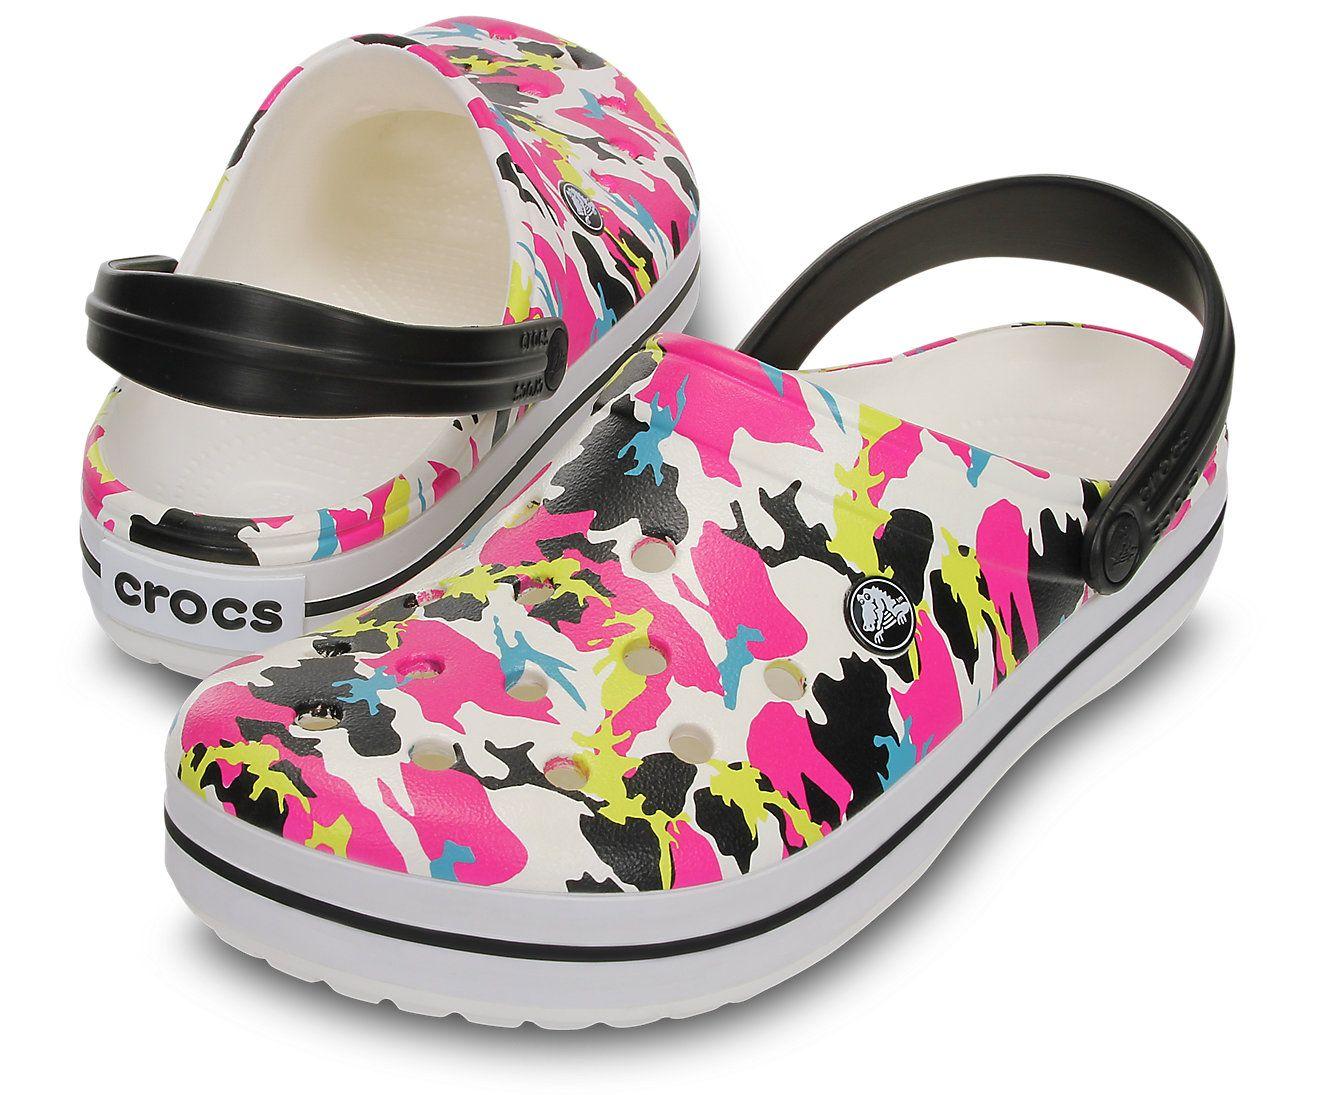 Crocs Kids Crocband Camo Graphic Clog